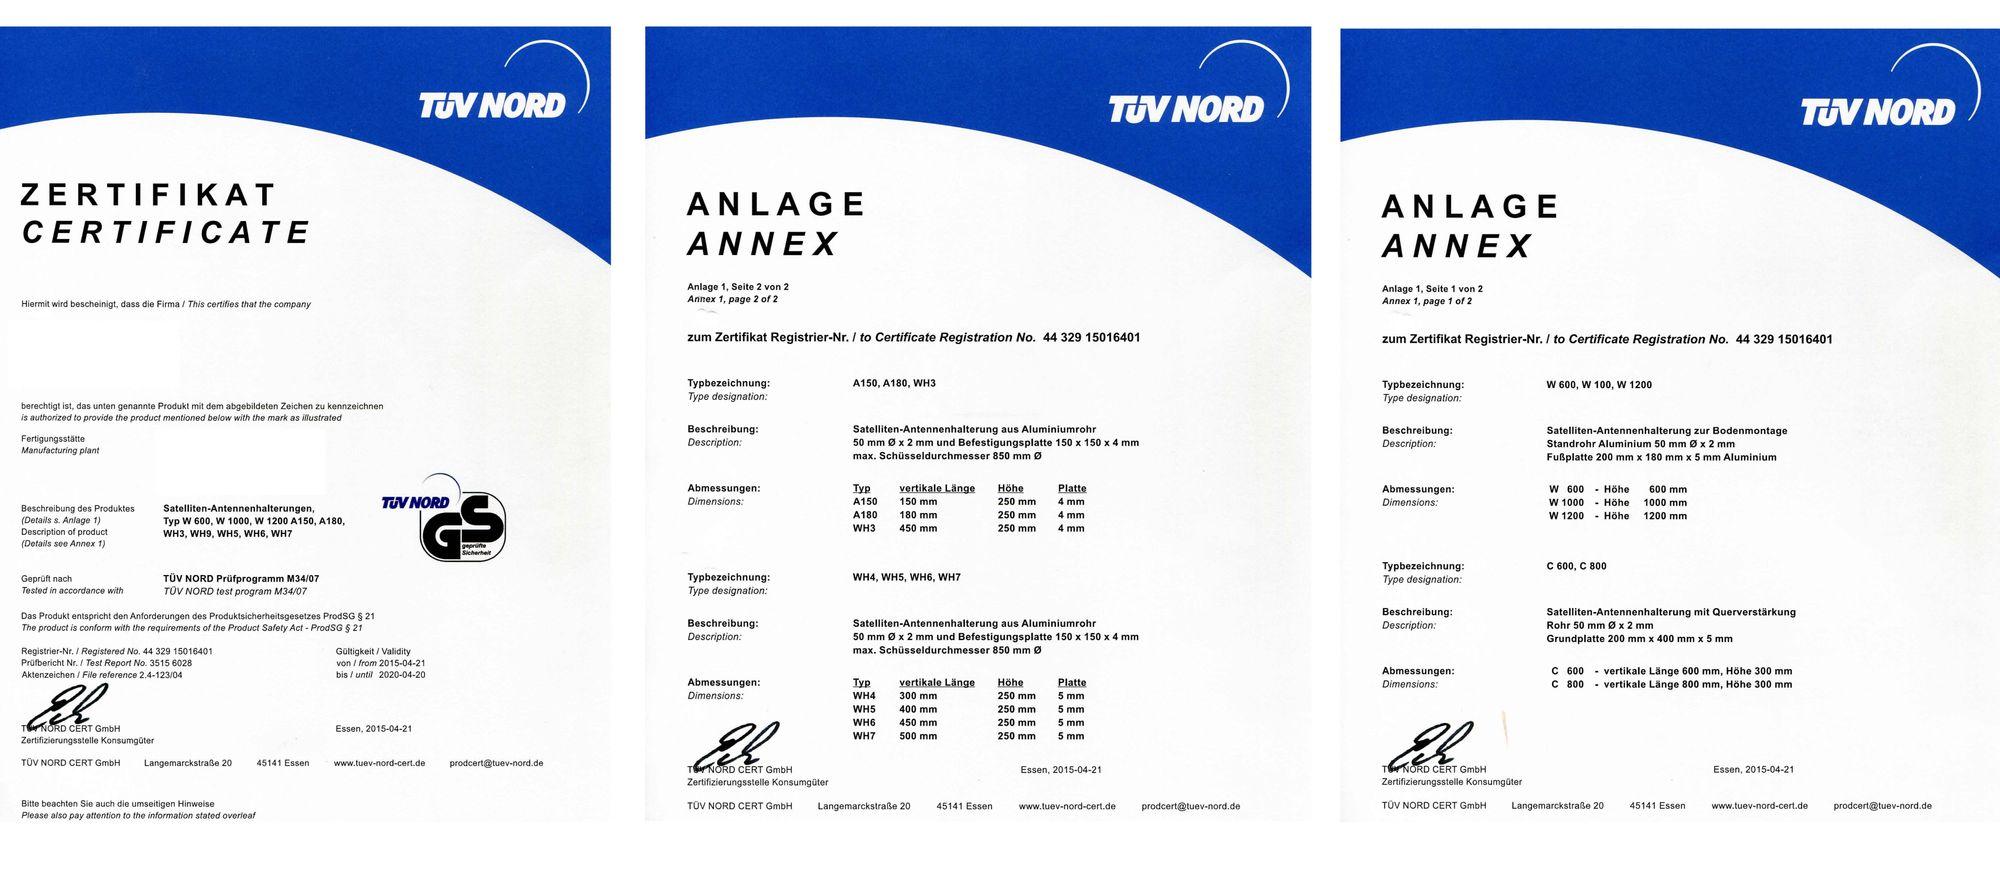 PremiumX 50-55cm Wandhalter ALU SAT Antenne Wand Halter aus Aluminium Wandhalterung TÜV Geprüft Wandabstand 500-550mm